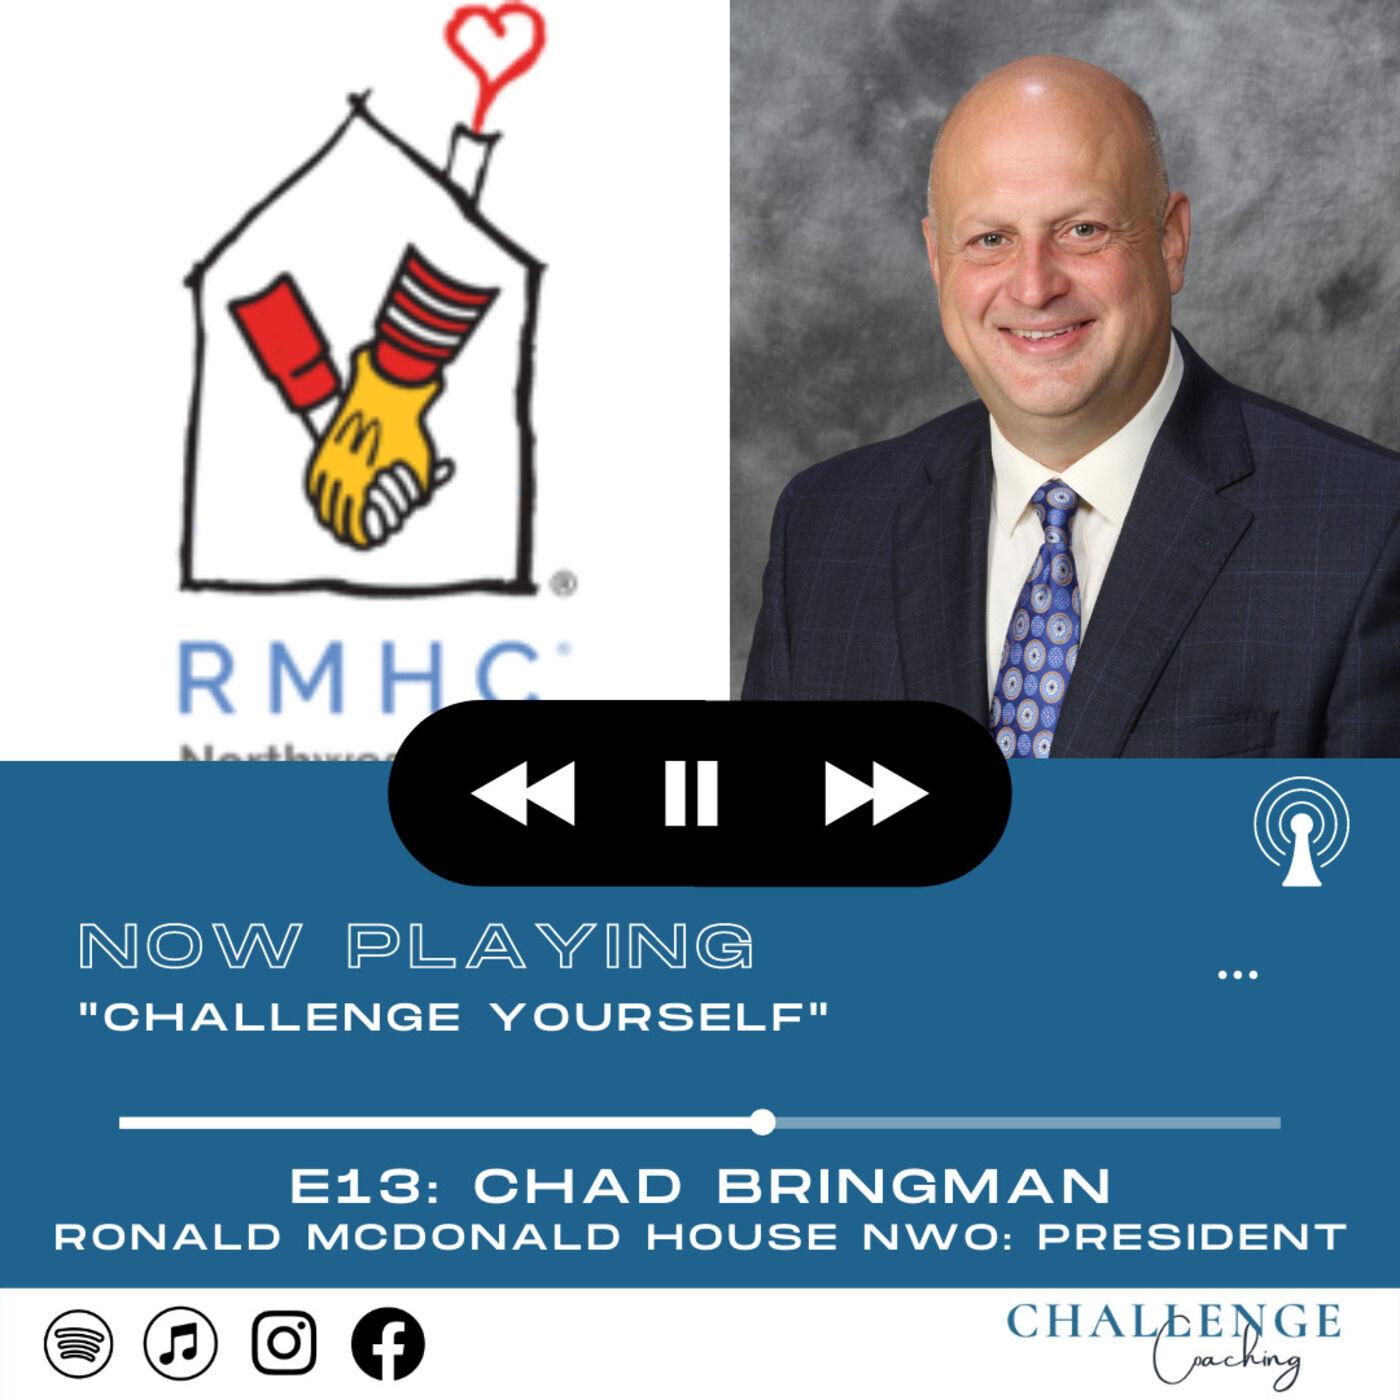 E13: Chad Bringman: Ronald McDonald House NWO President